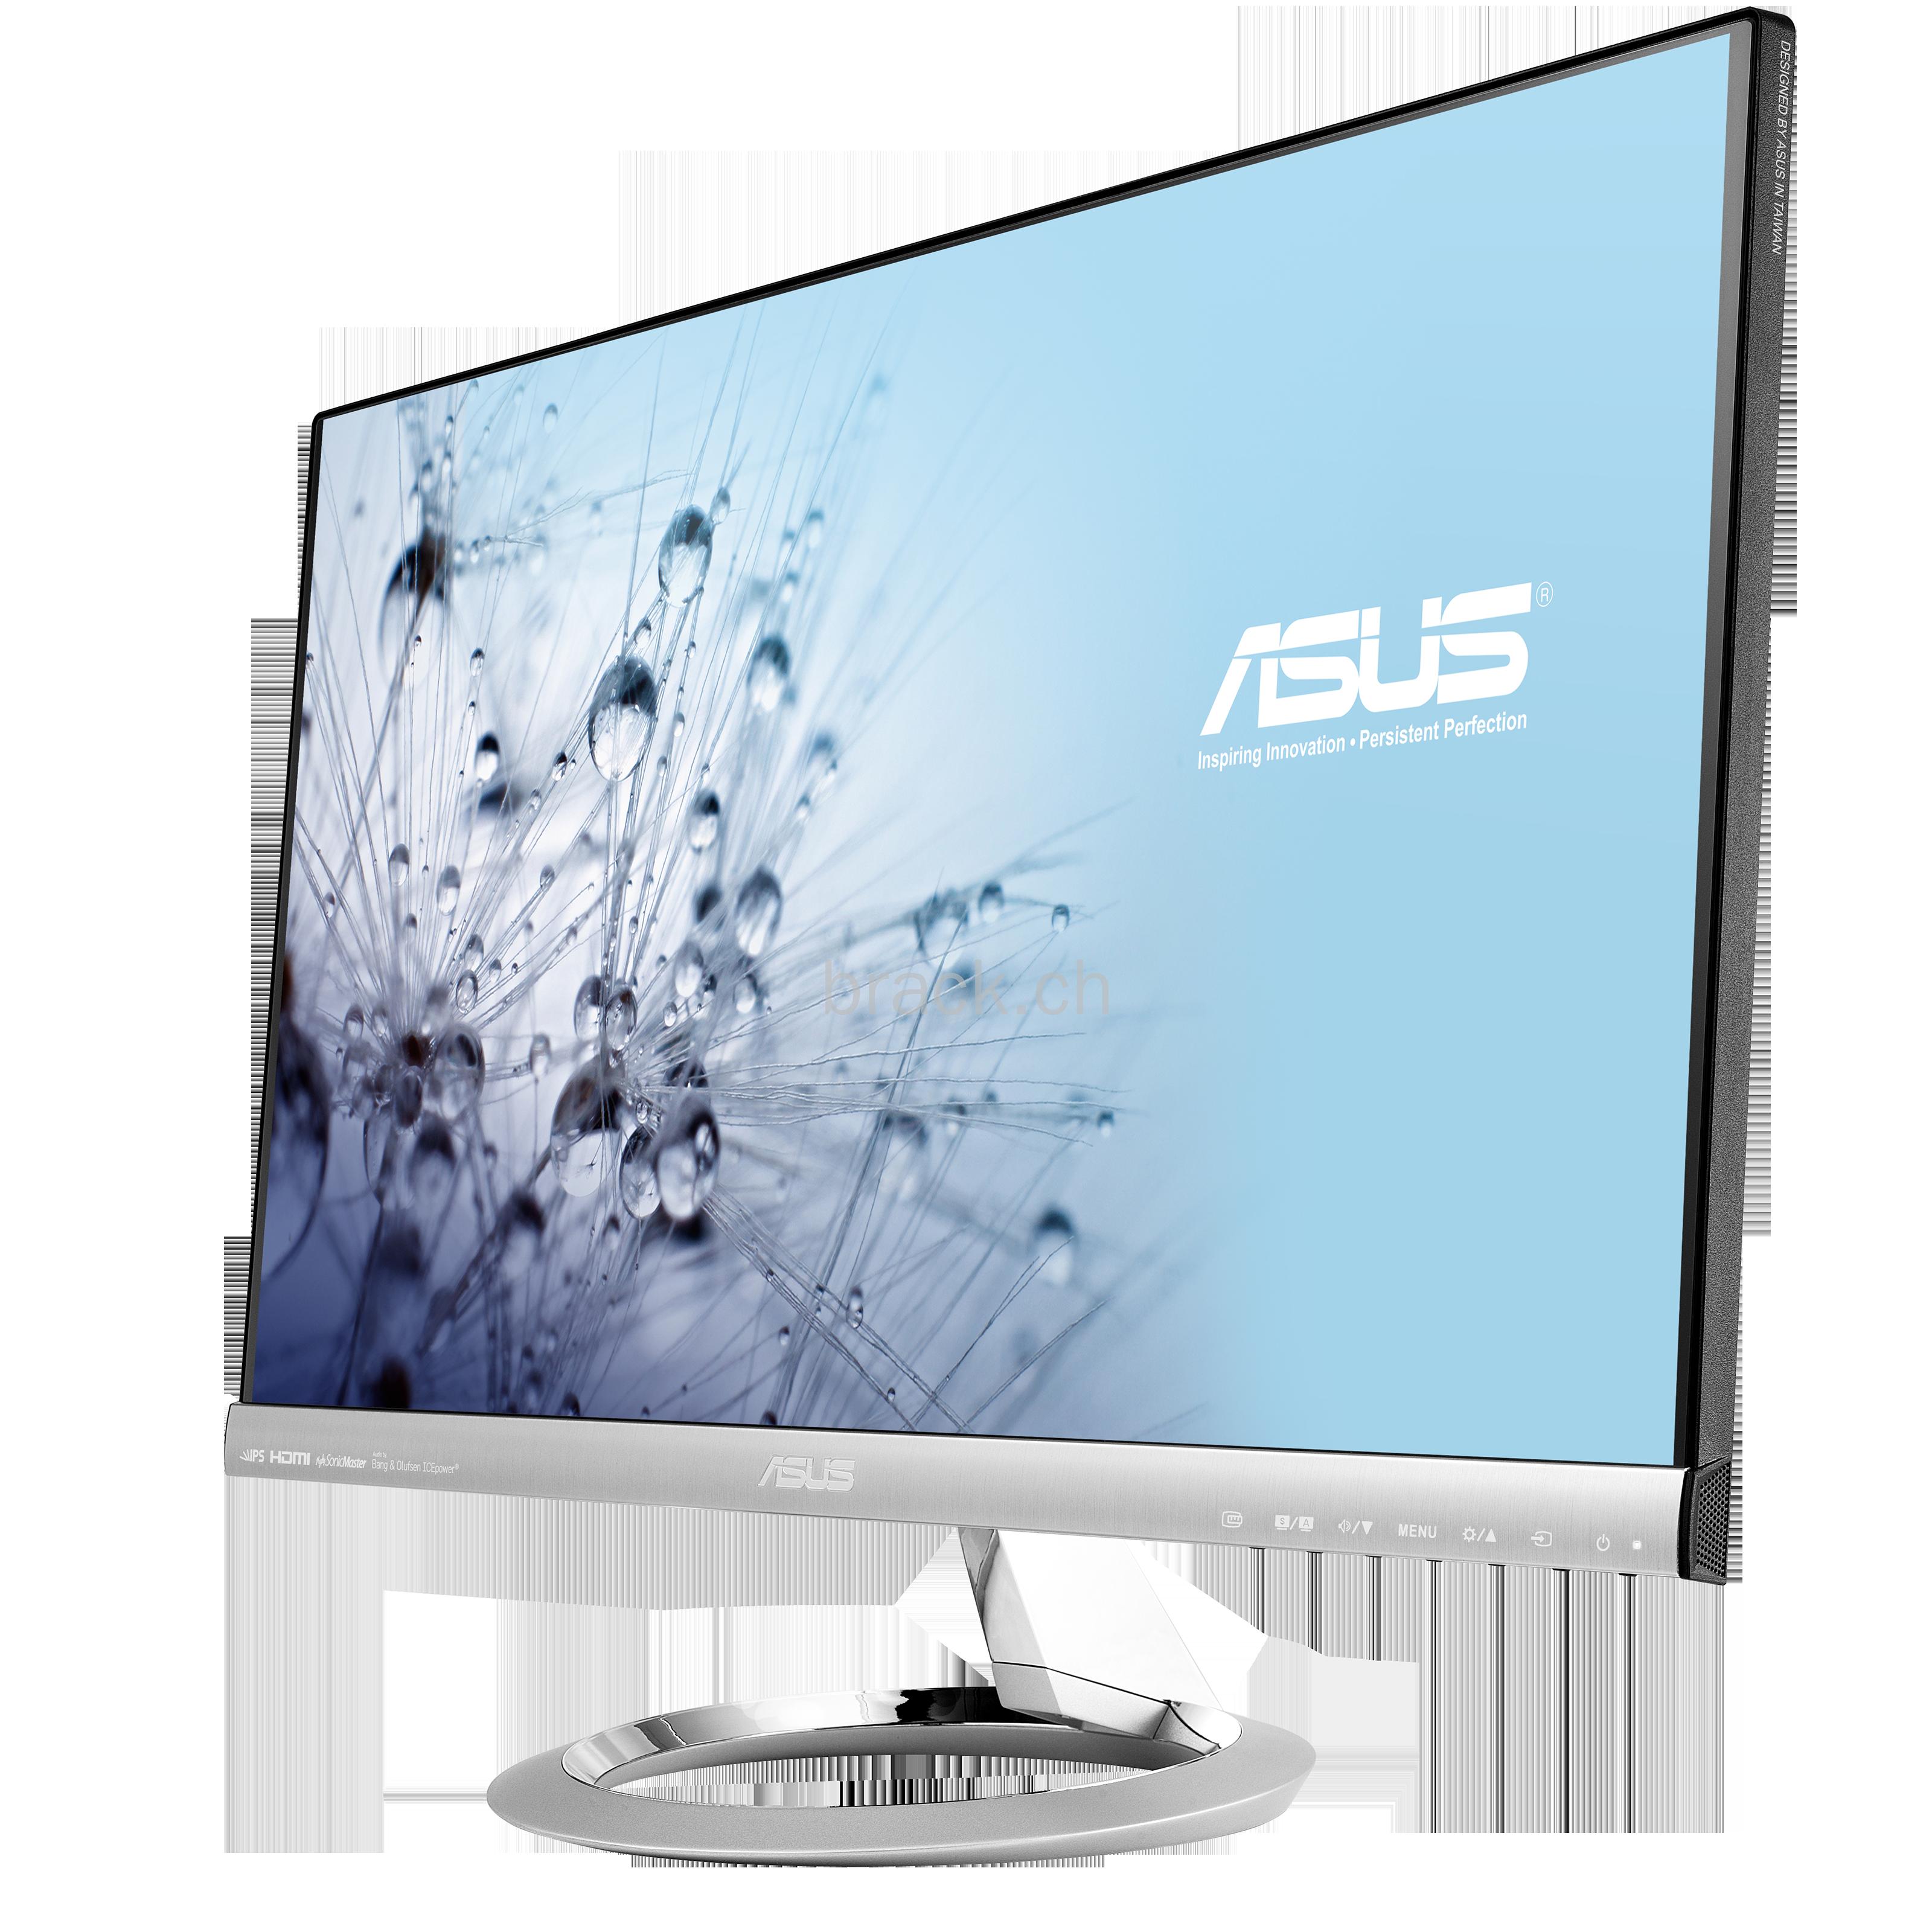 Asus | MX239H | 23 MX239H | 23 inch | LED | 1920 x 1080 pixeli | 5 ms | DVI | 2 x HDMI